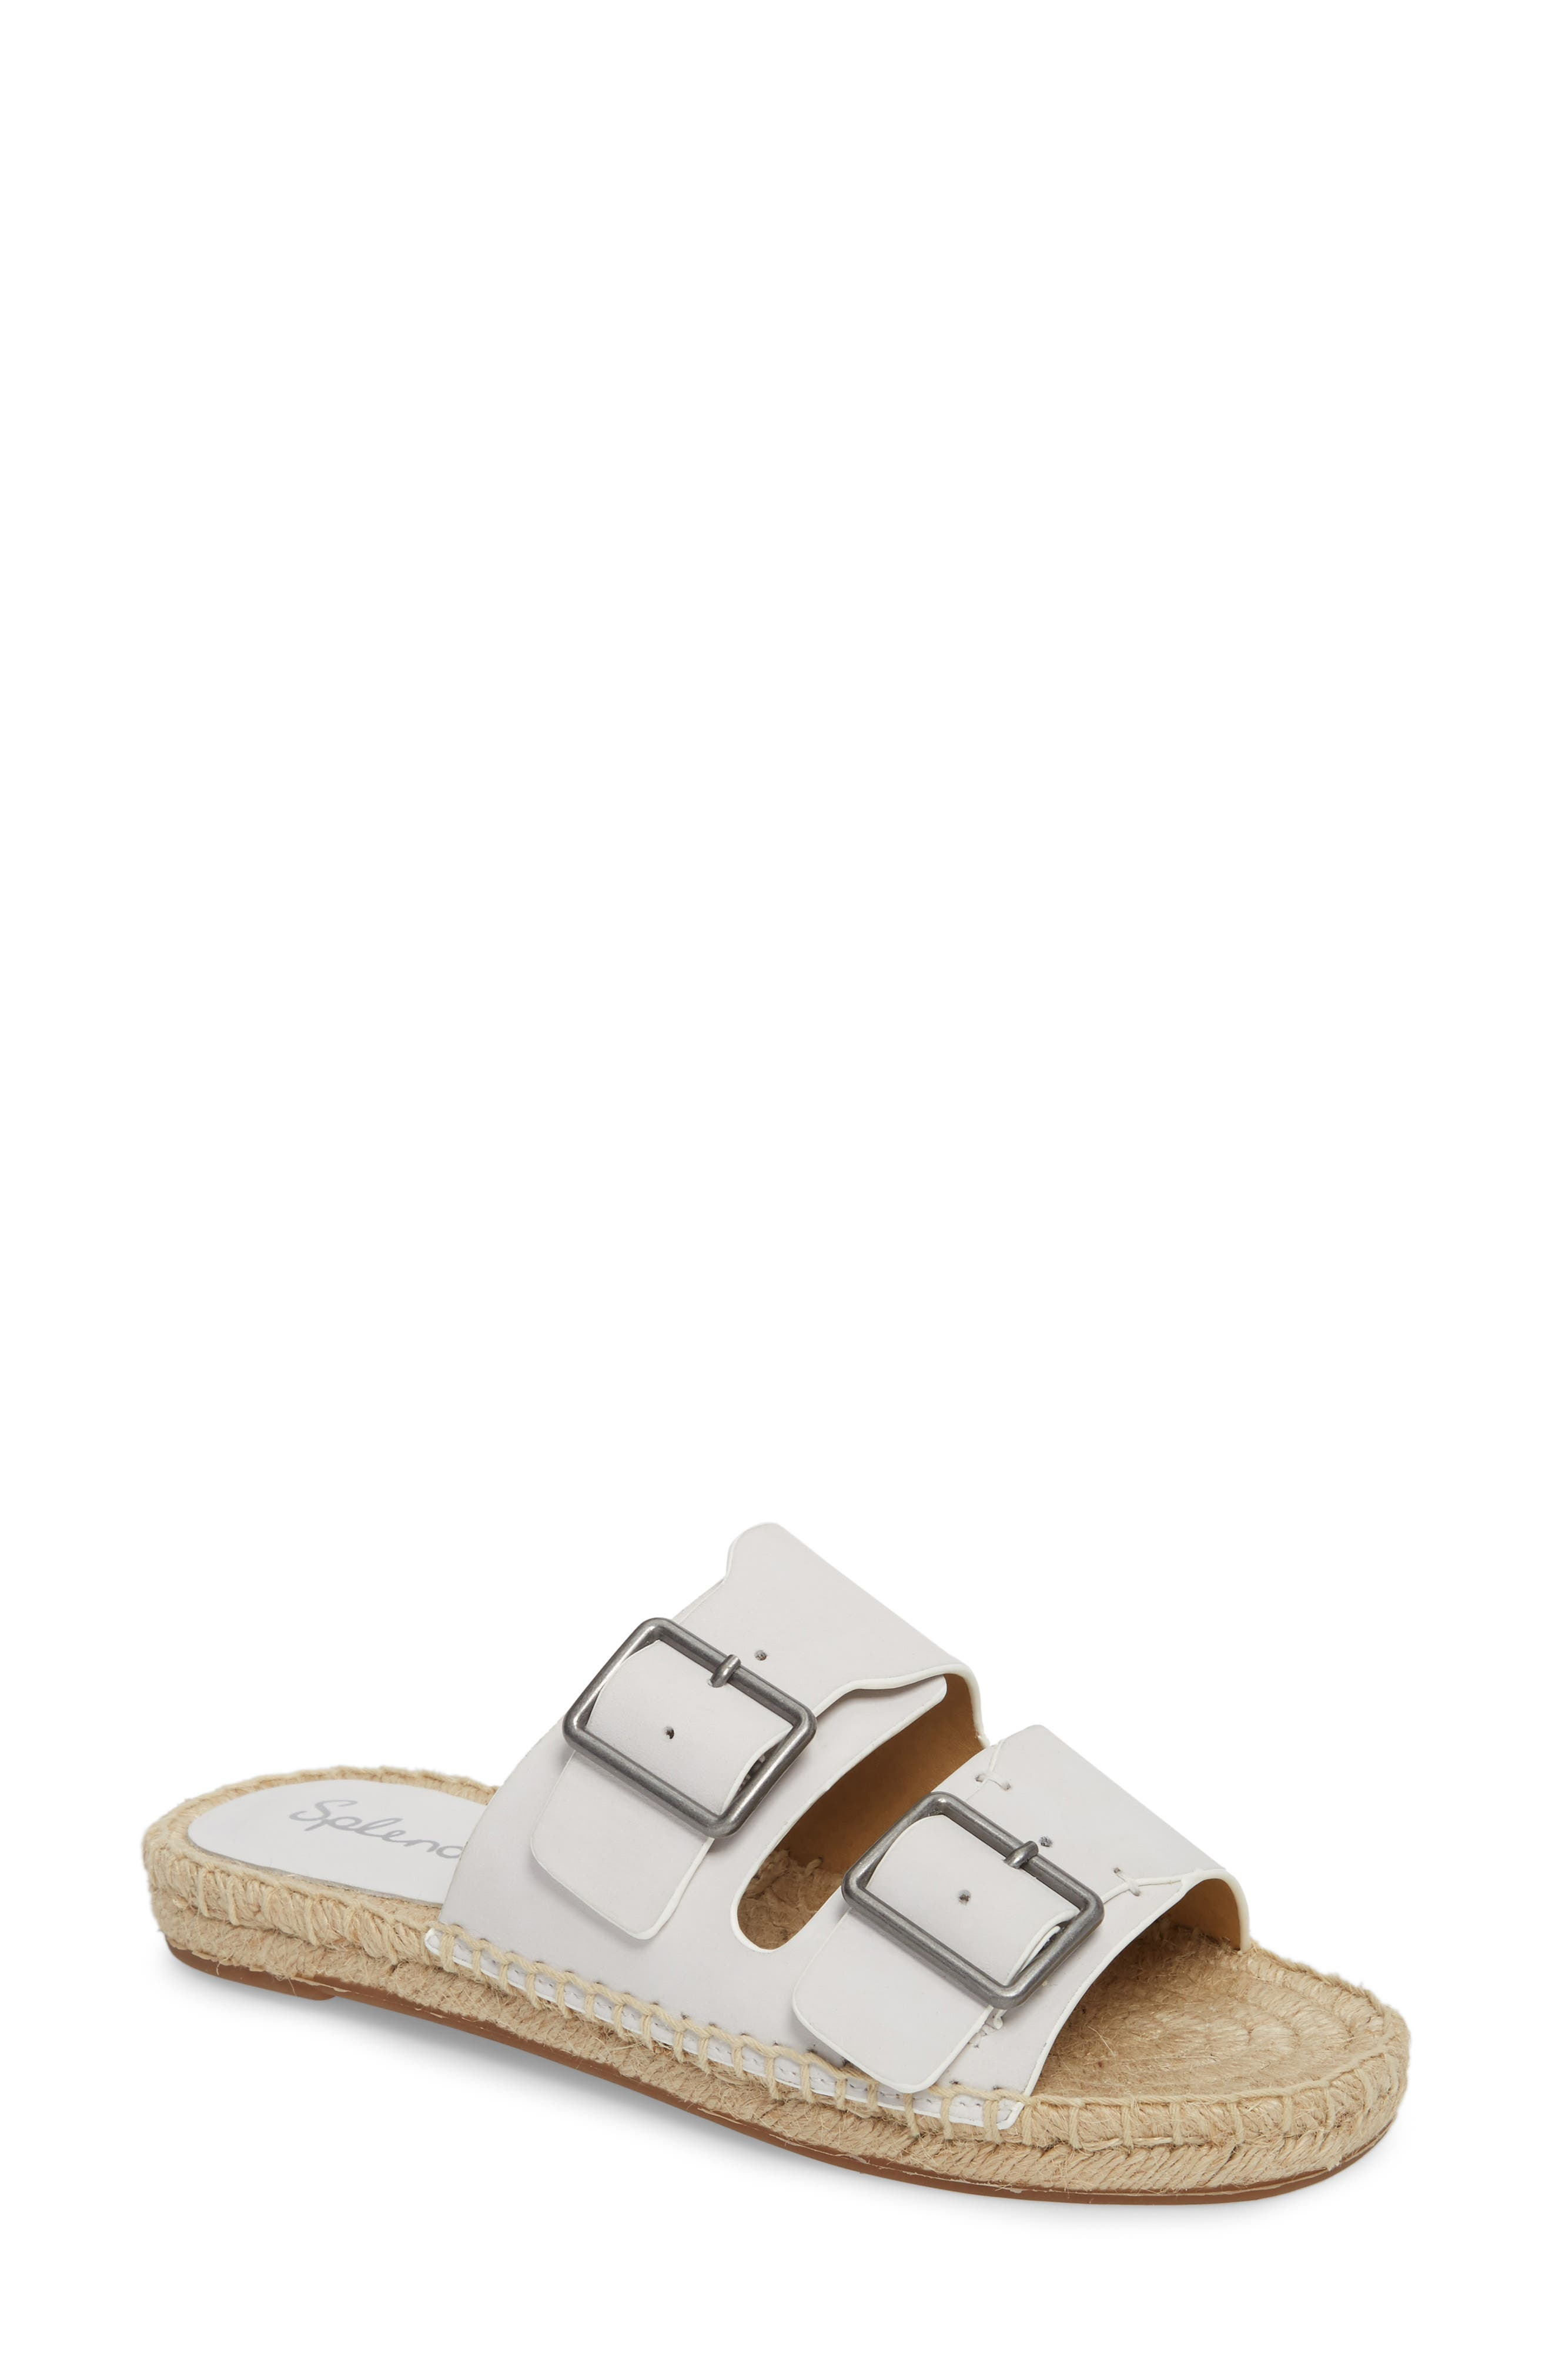 Blake Buckle Espadrille Sandal,                         Main,                         color, White Leather